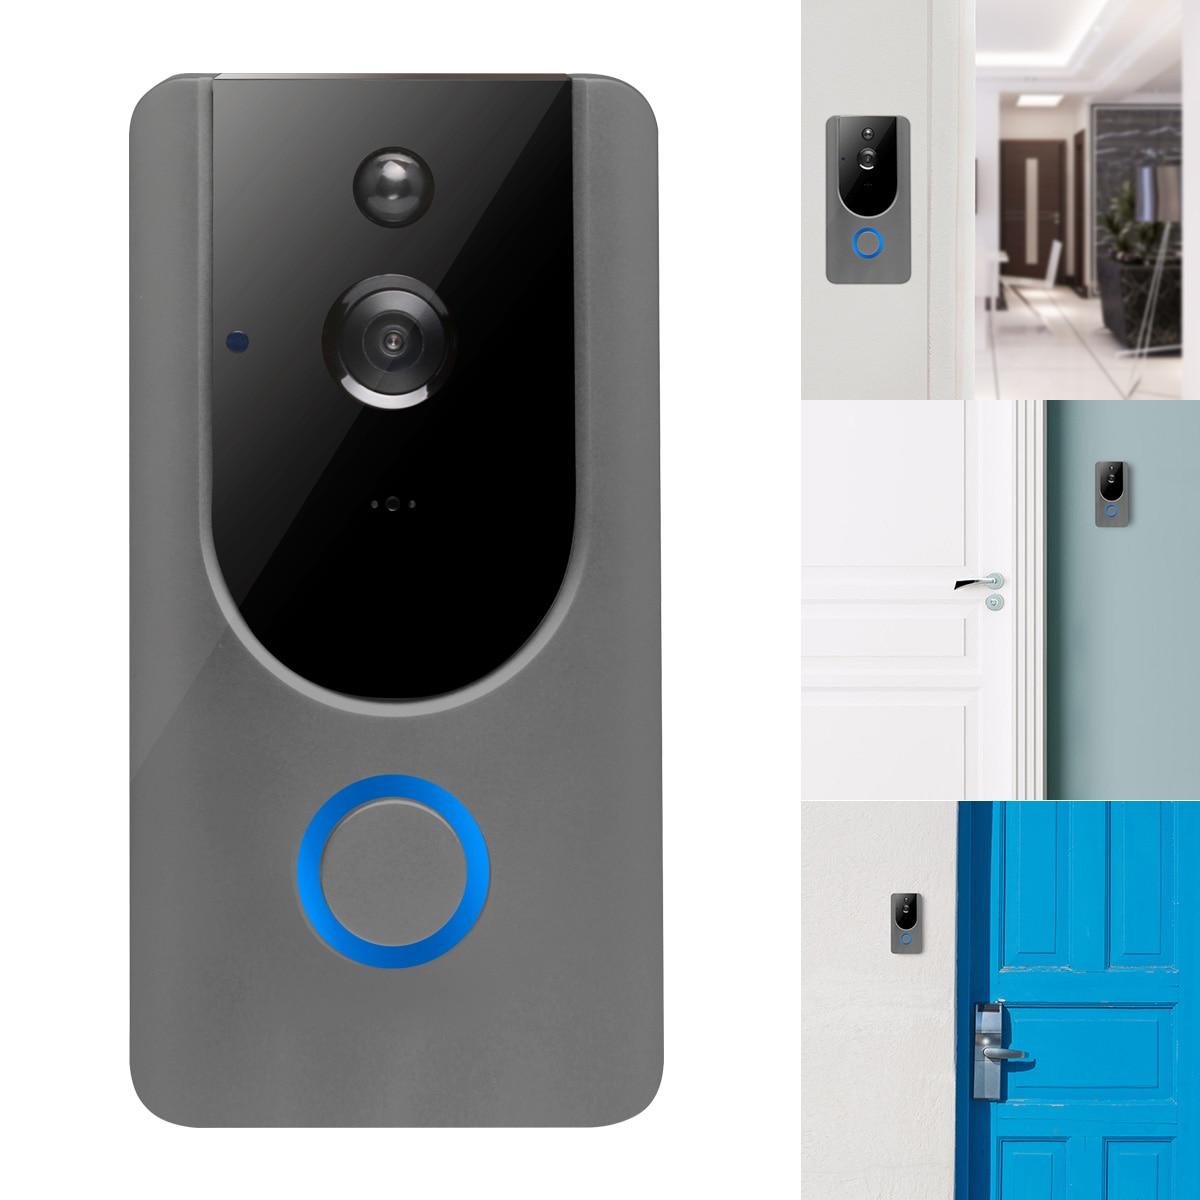 New Wireless Doorbell Waterproof Remote Door Bell Visual Recording Remote Home Monitor Night Vision Video Intercom